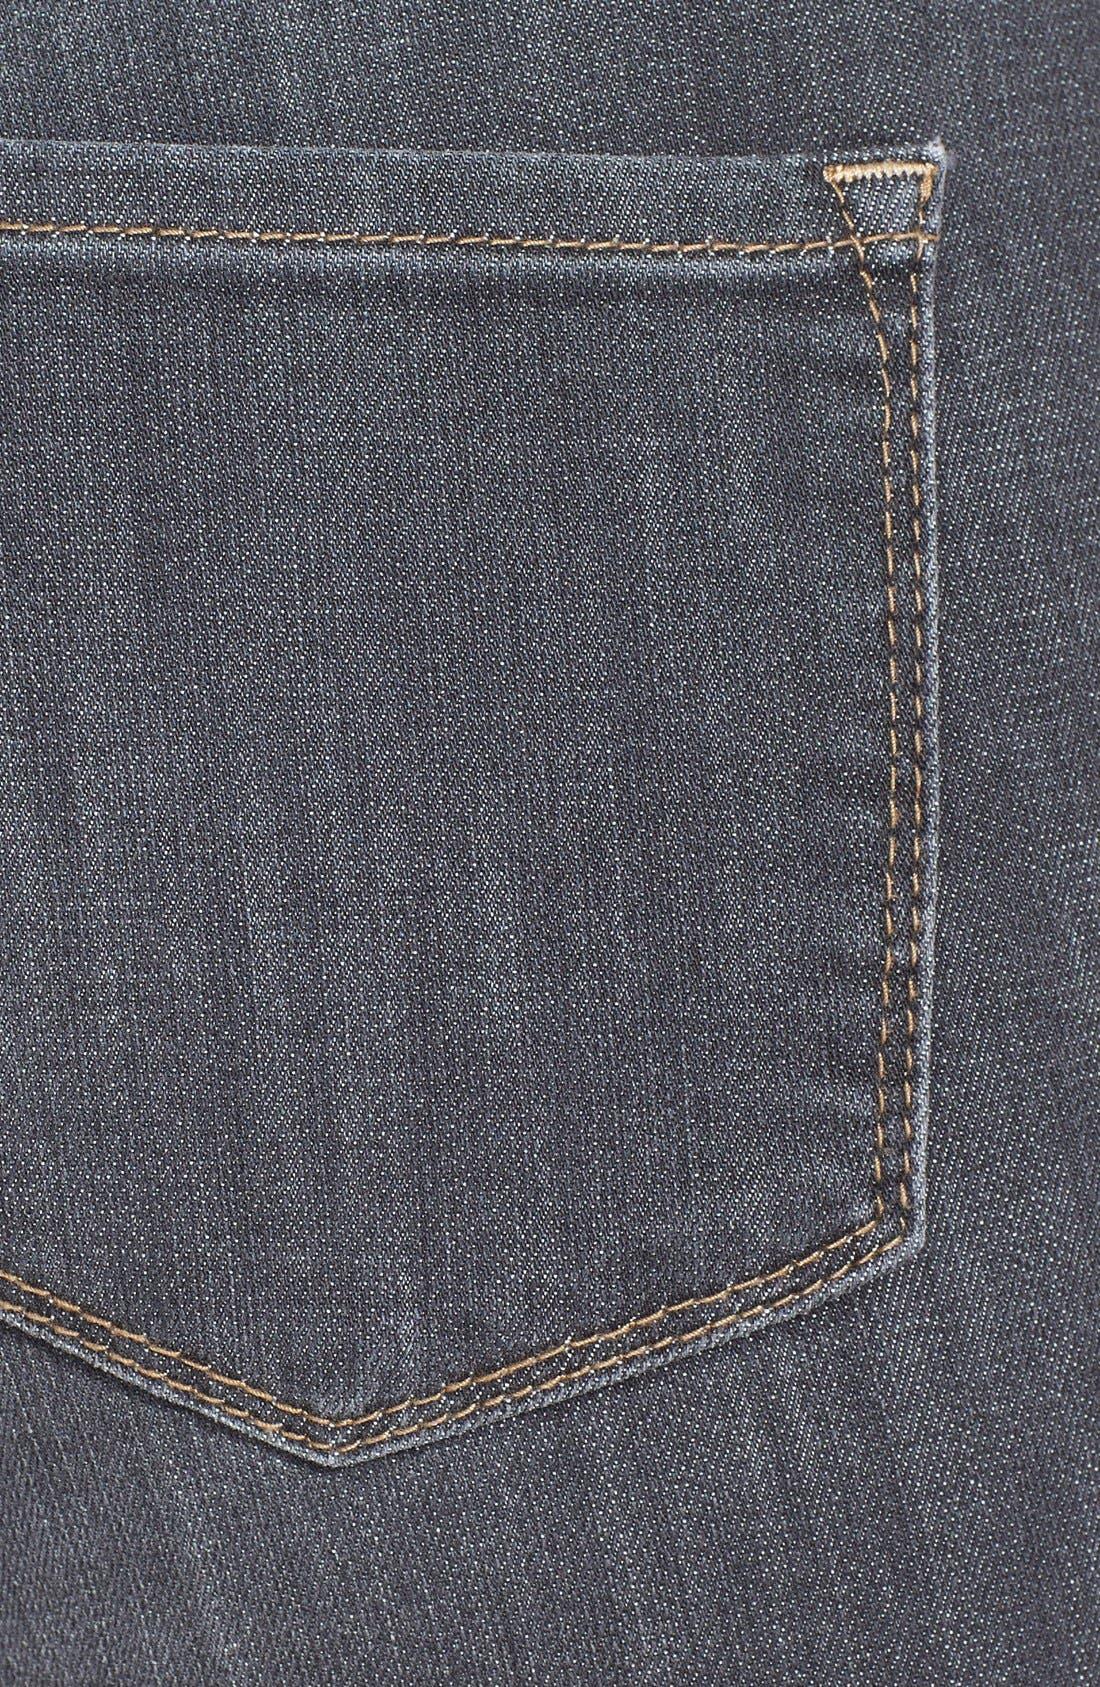 Alternate Image 3  - NYDJ 'Ami' Stretch Skinny Jeans (Dakota) (Regular & Petite)